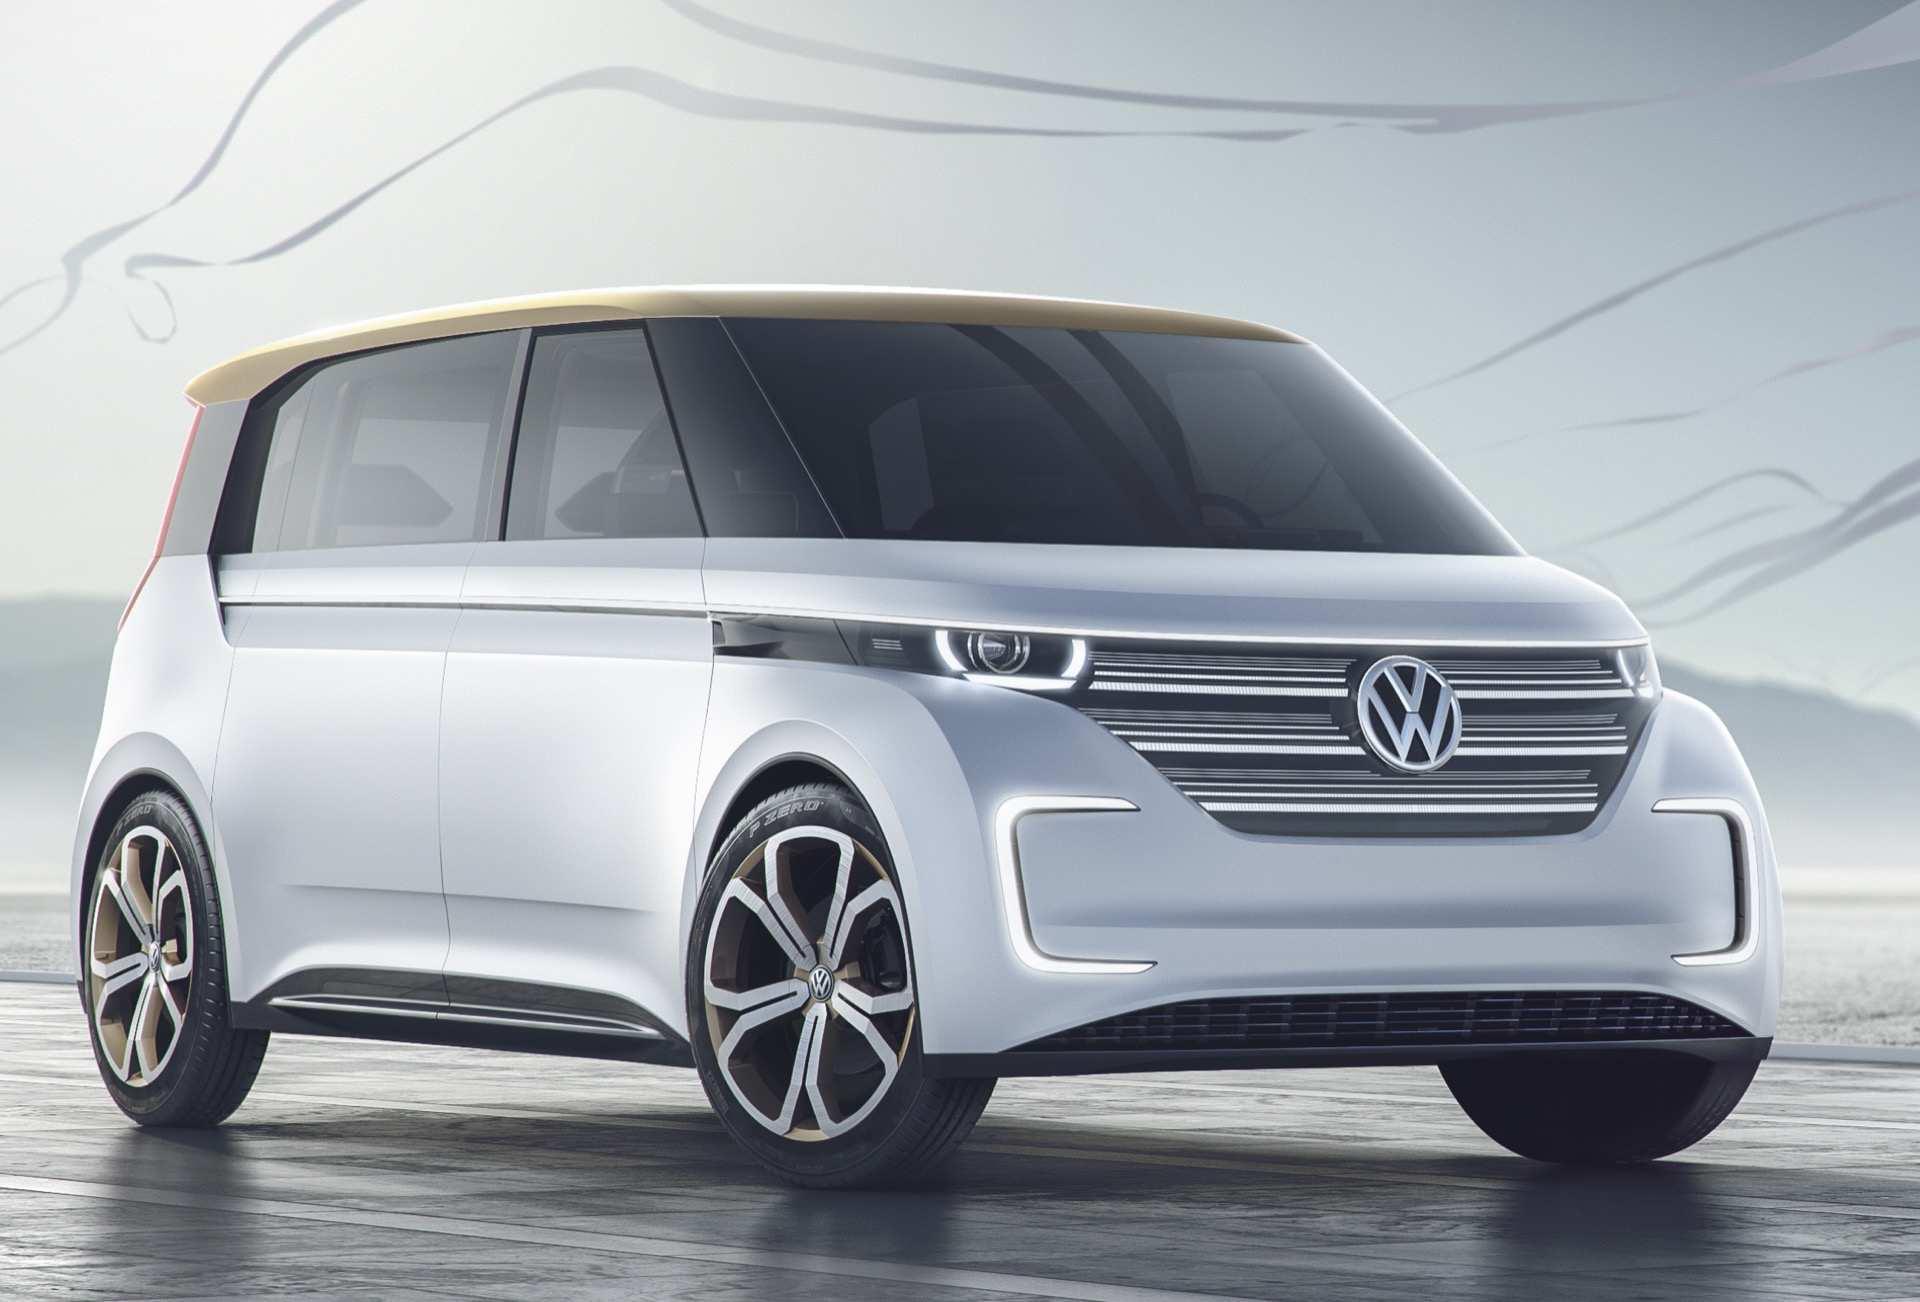 95 The Future Volkswagen 2020 Price by Future Volkswagen 2020